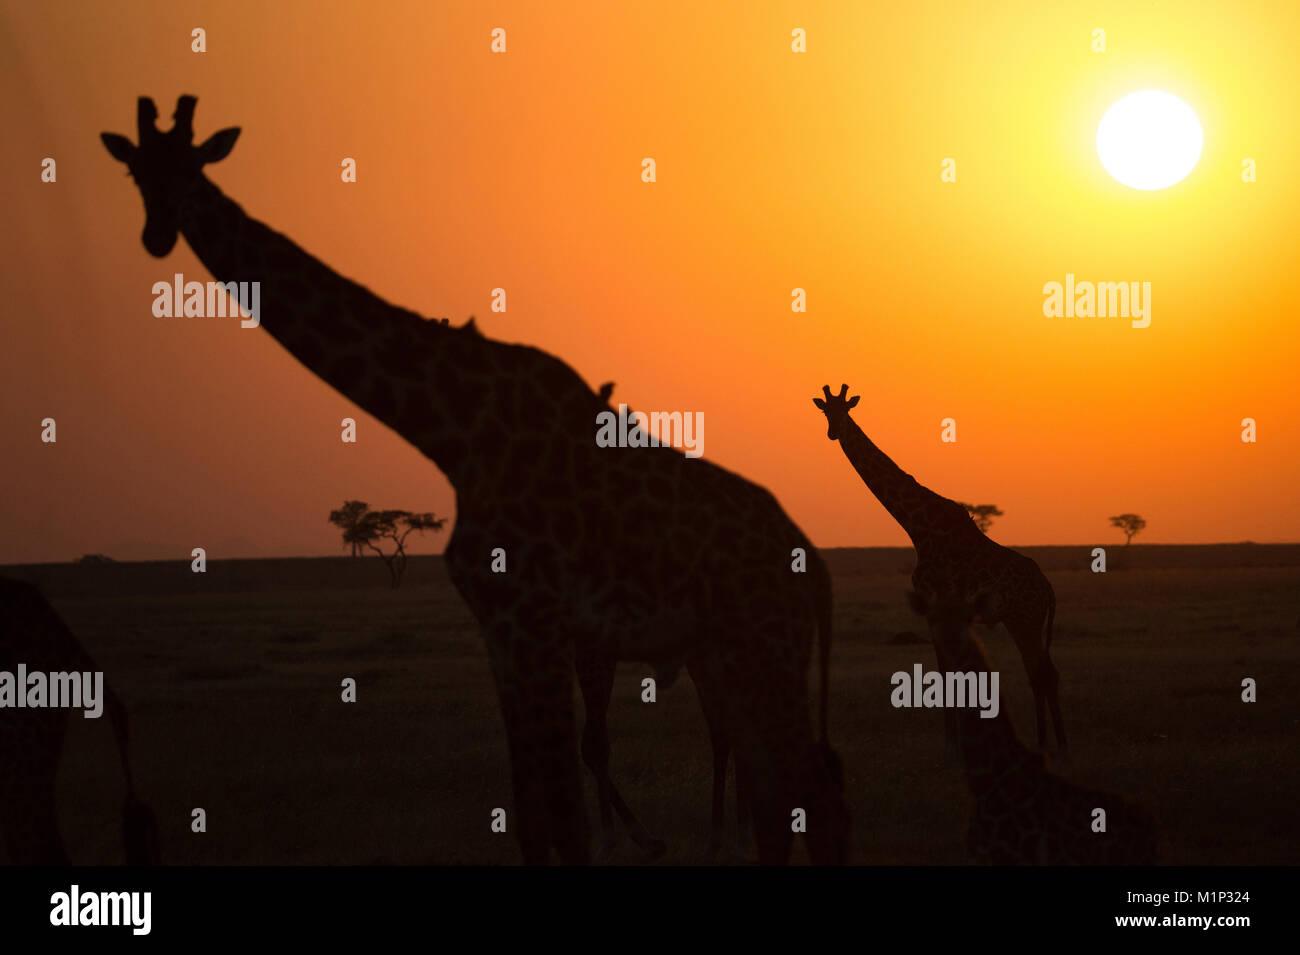 Siluetas de jirafa (Giraffa camelopardalis) al atardecer, el Parque nacional Serengeti, Tanzania, África oriental, Imagen De Stock